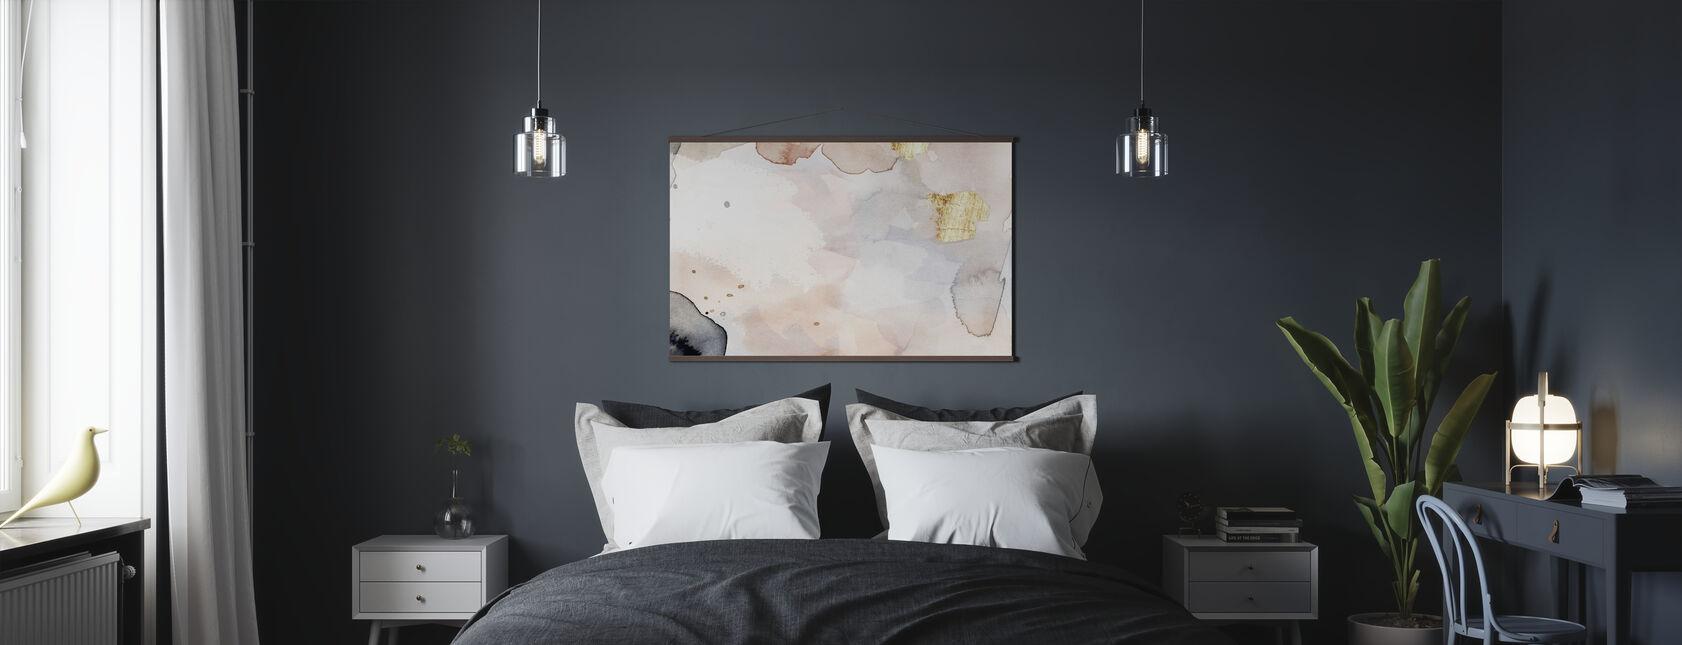 Indigo Blush en Goud - Poster - Slaapkamer